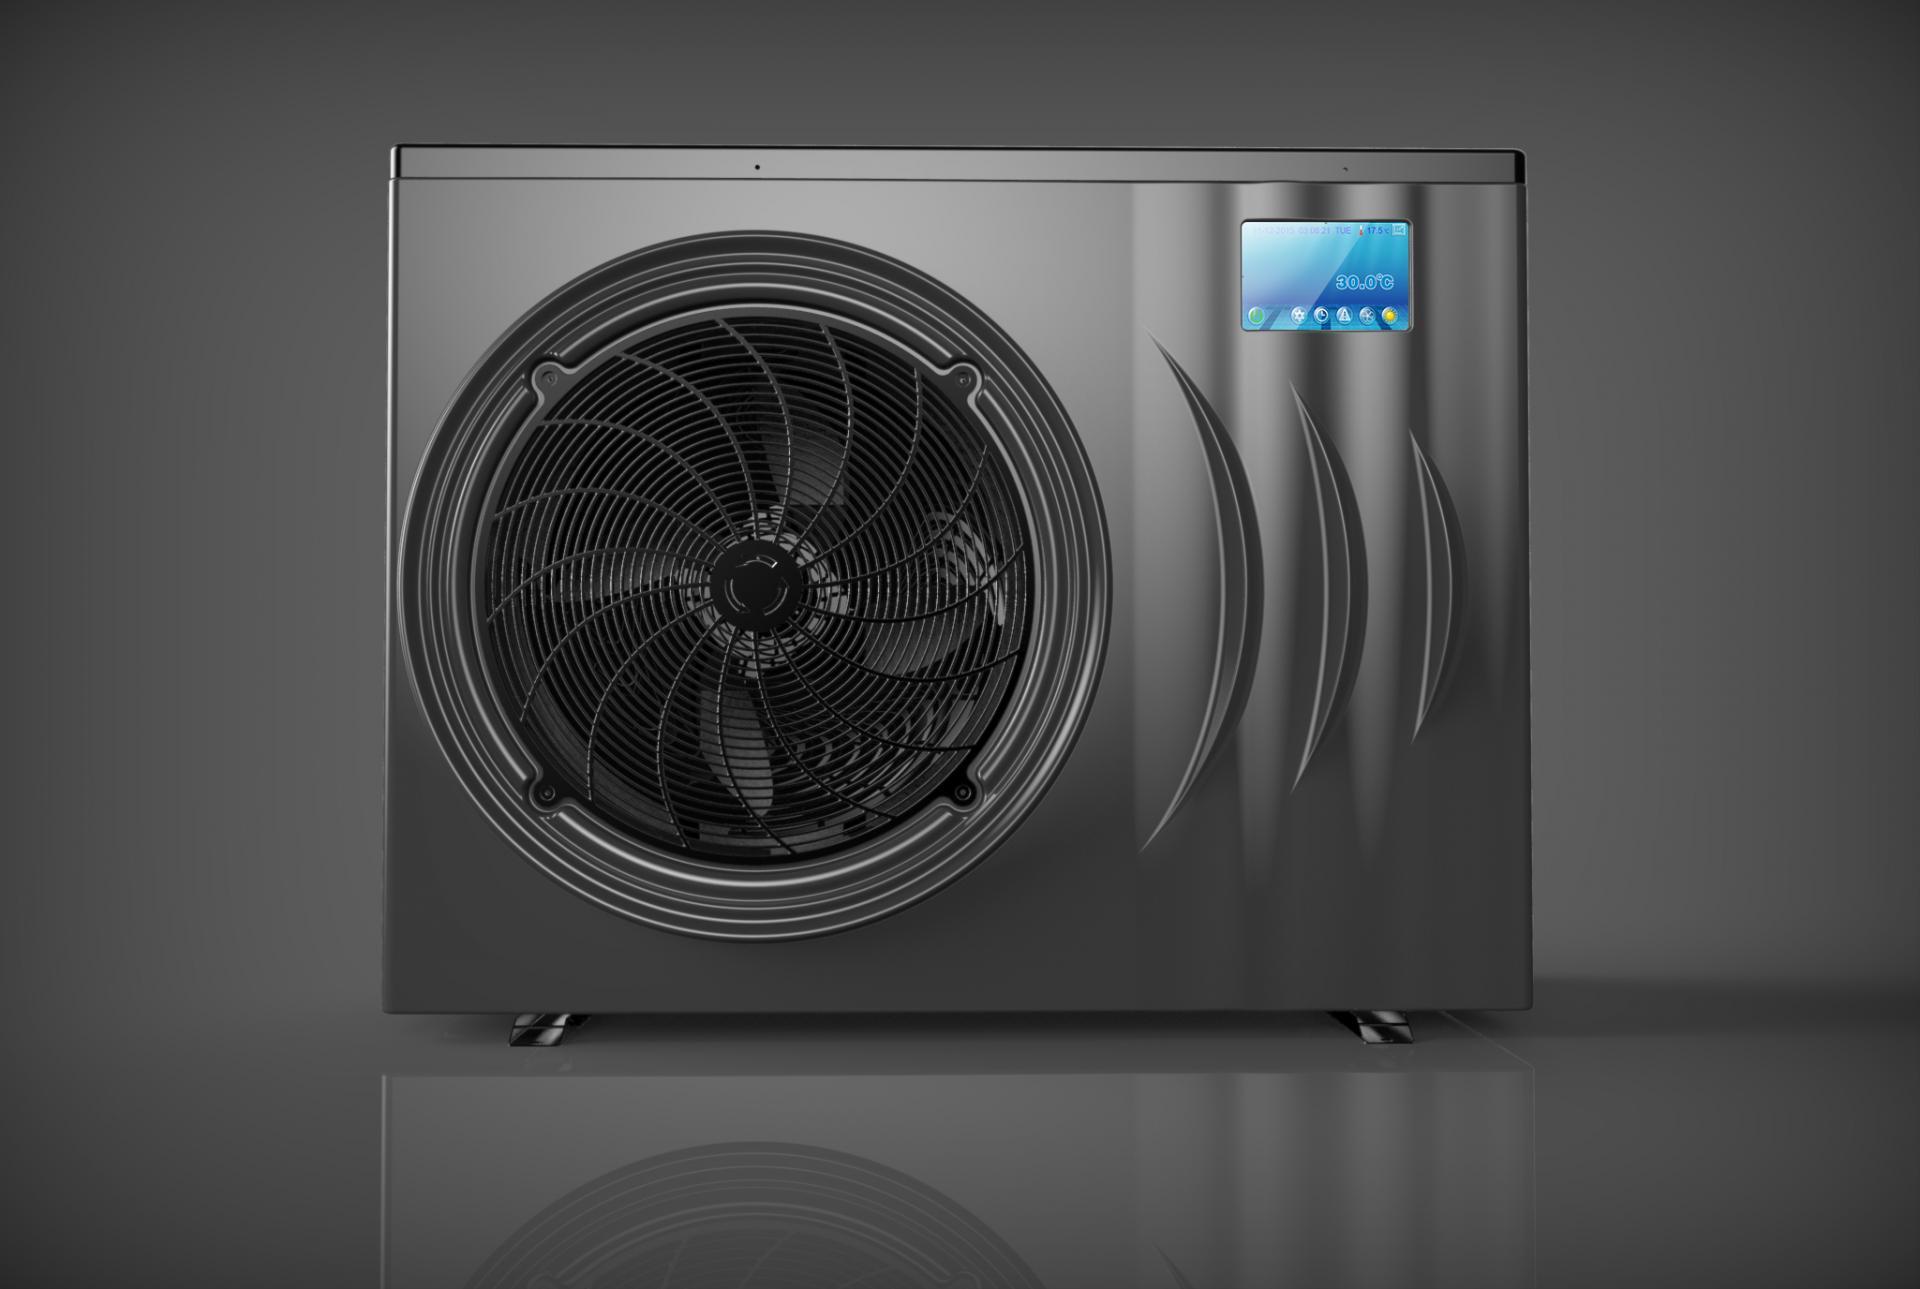 duratech inverter warmtepomp pro